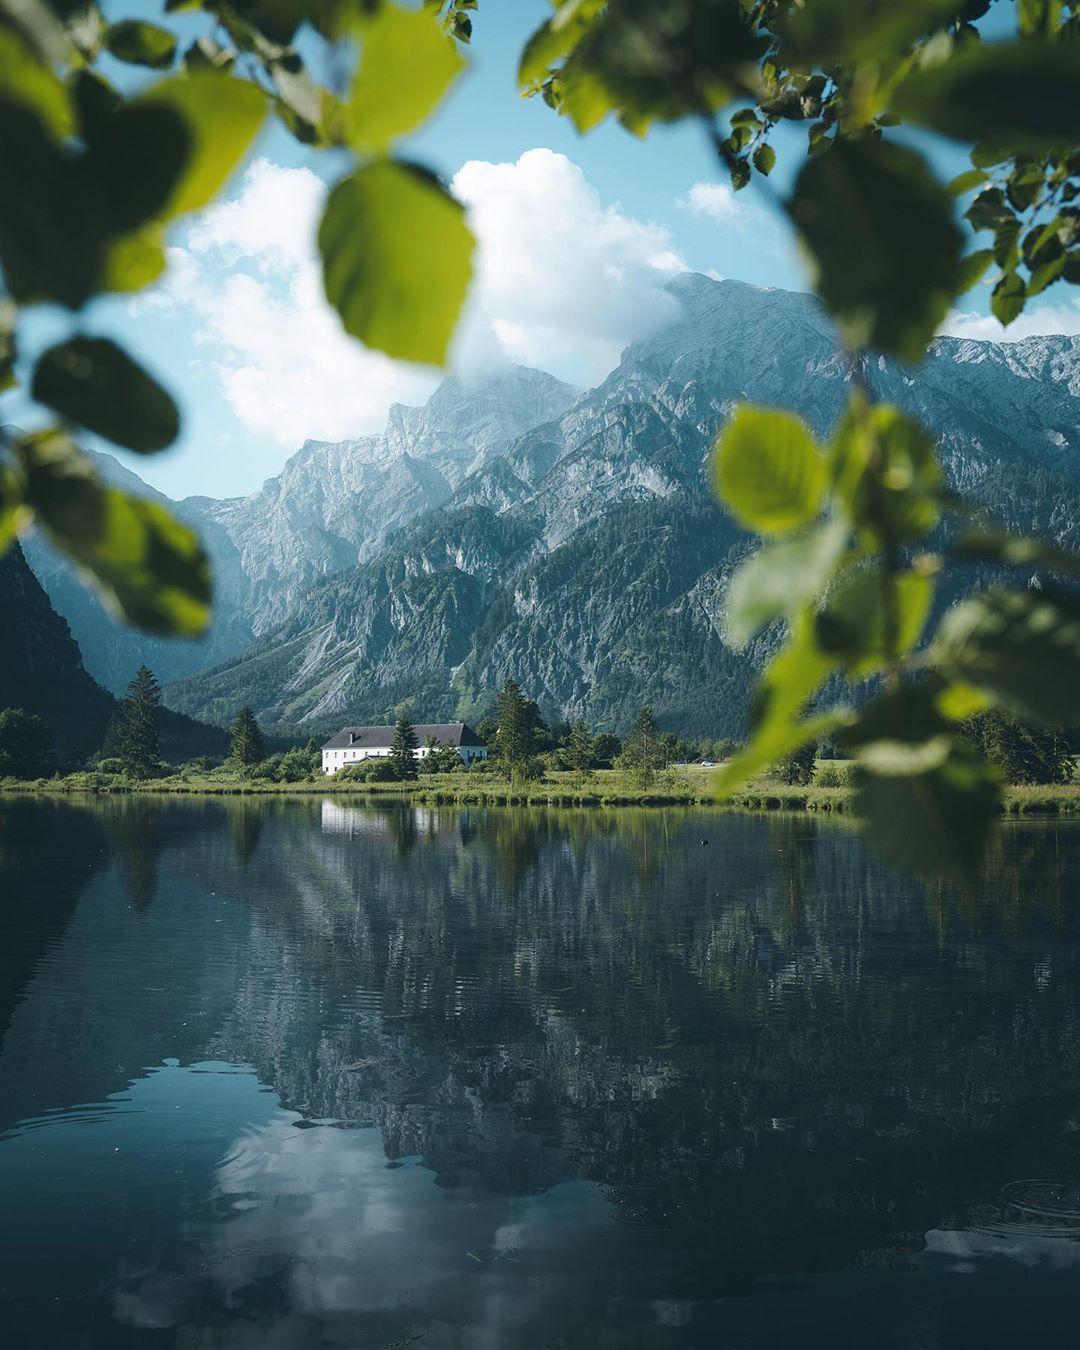 "Manuela Palmberger - Germany 📷 on Instagram: ""Mornings well spend in Austria 🙌 . . . #lake #reflection #reflectionphotography #sunrise #österreich #salzburgerland #austria #visitaustria…"""